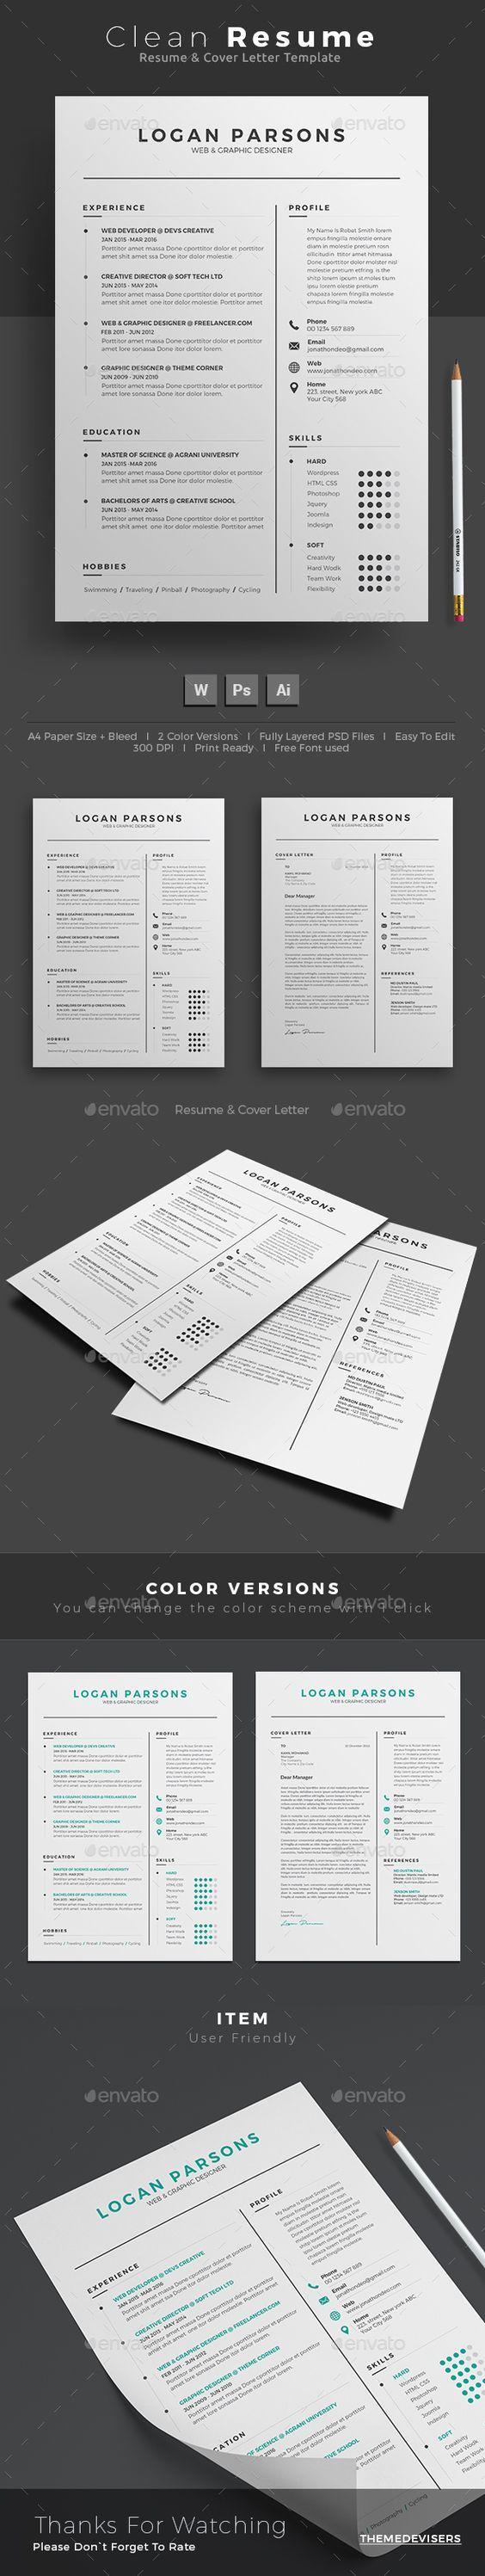 Berühmt Frei Druckbare Zeitplanvorlage Ideen - Entry Level Resume ...